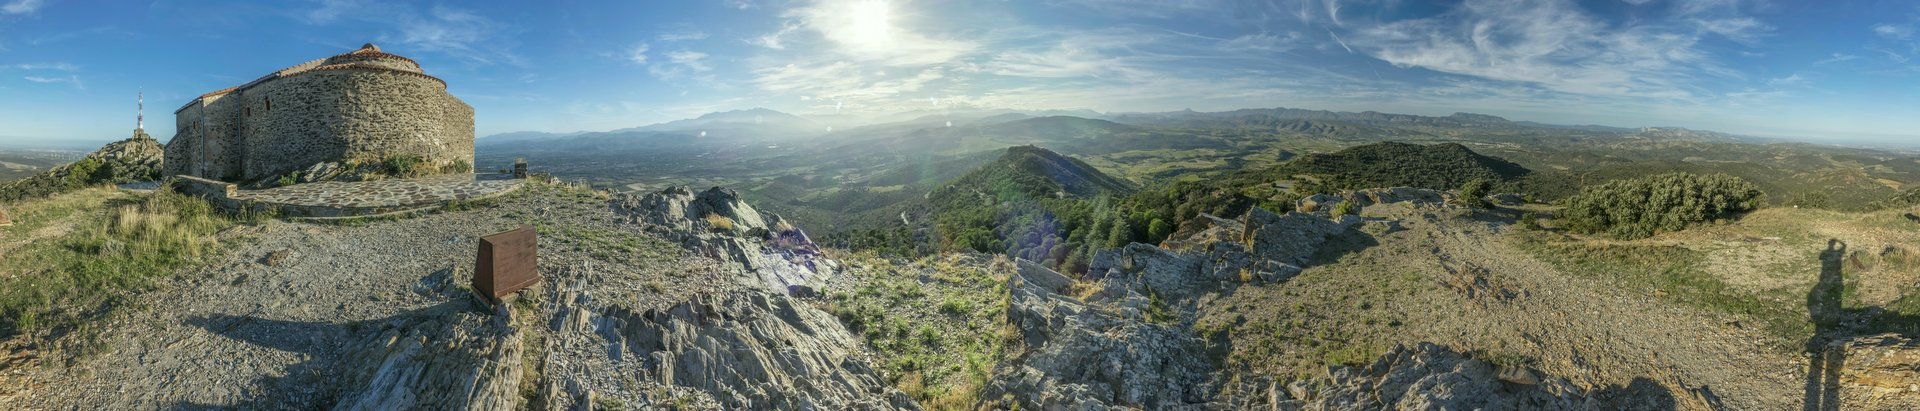 360° Panorama hinter der Eremitage auf dem Força Réal